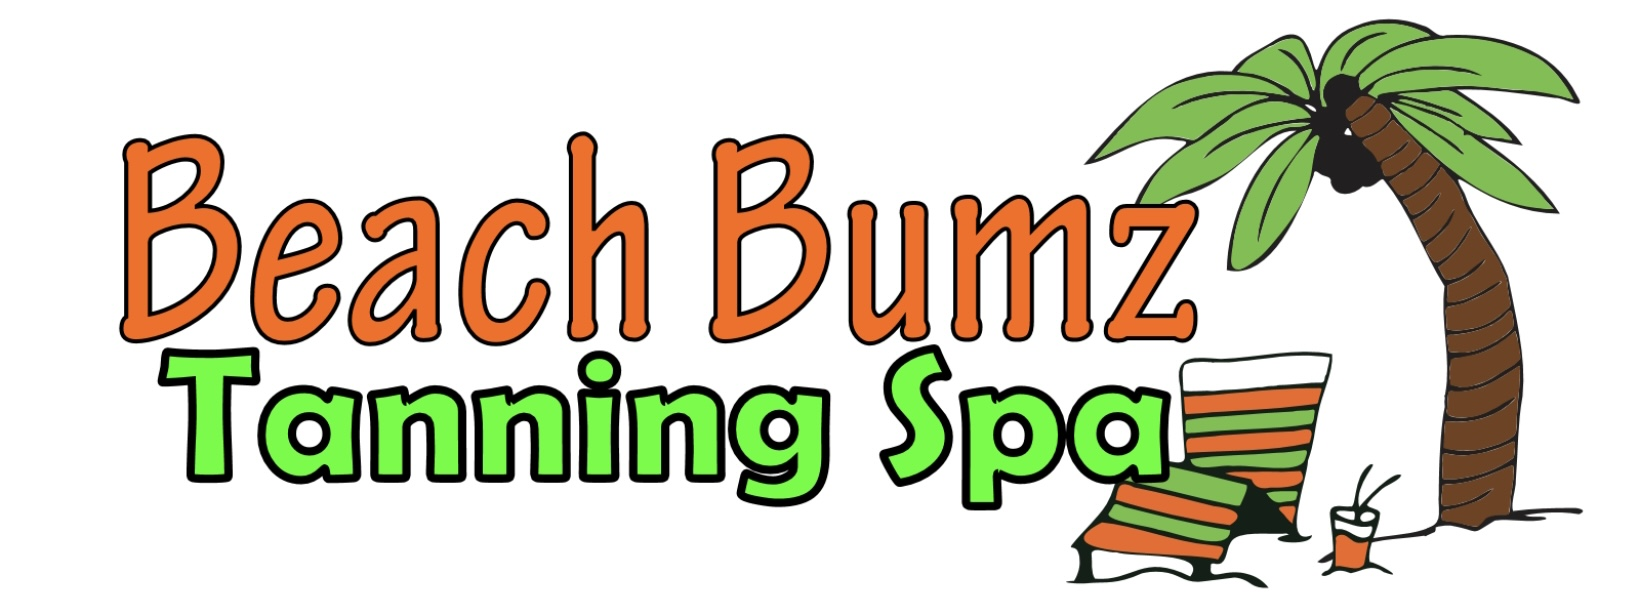 Beach Bumz logo